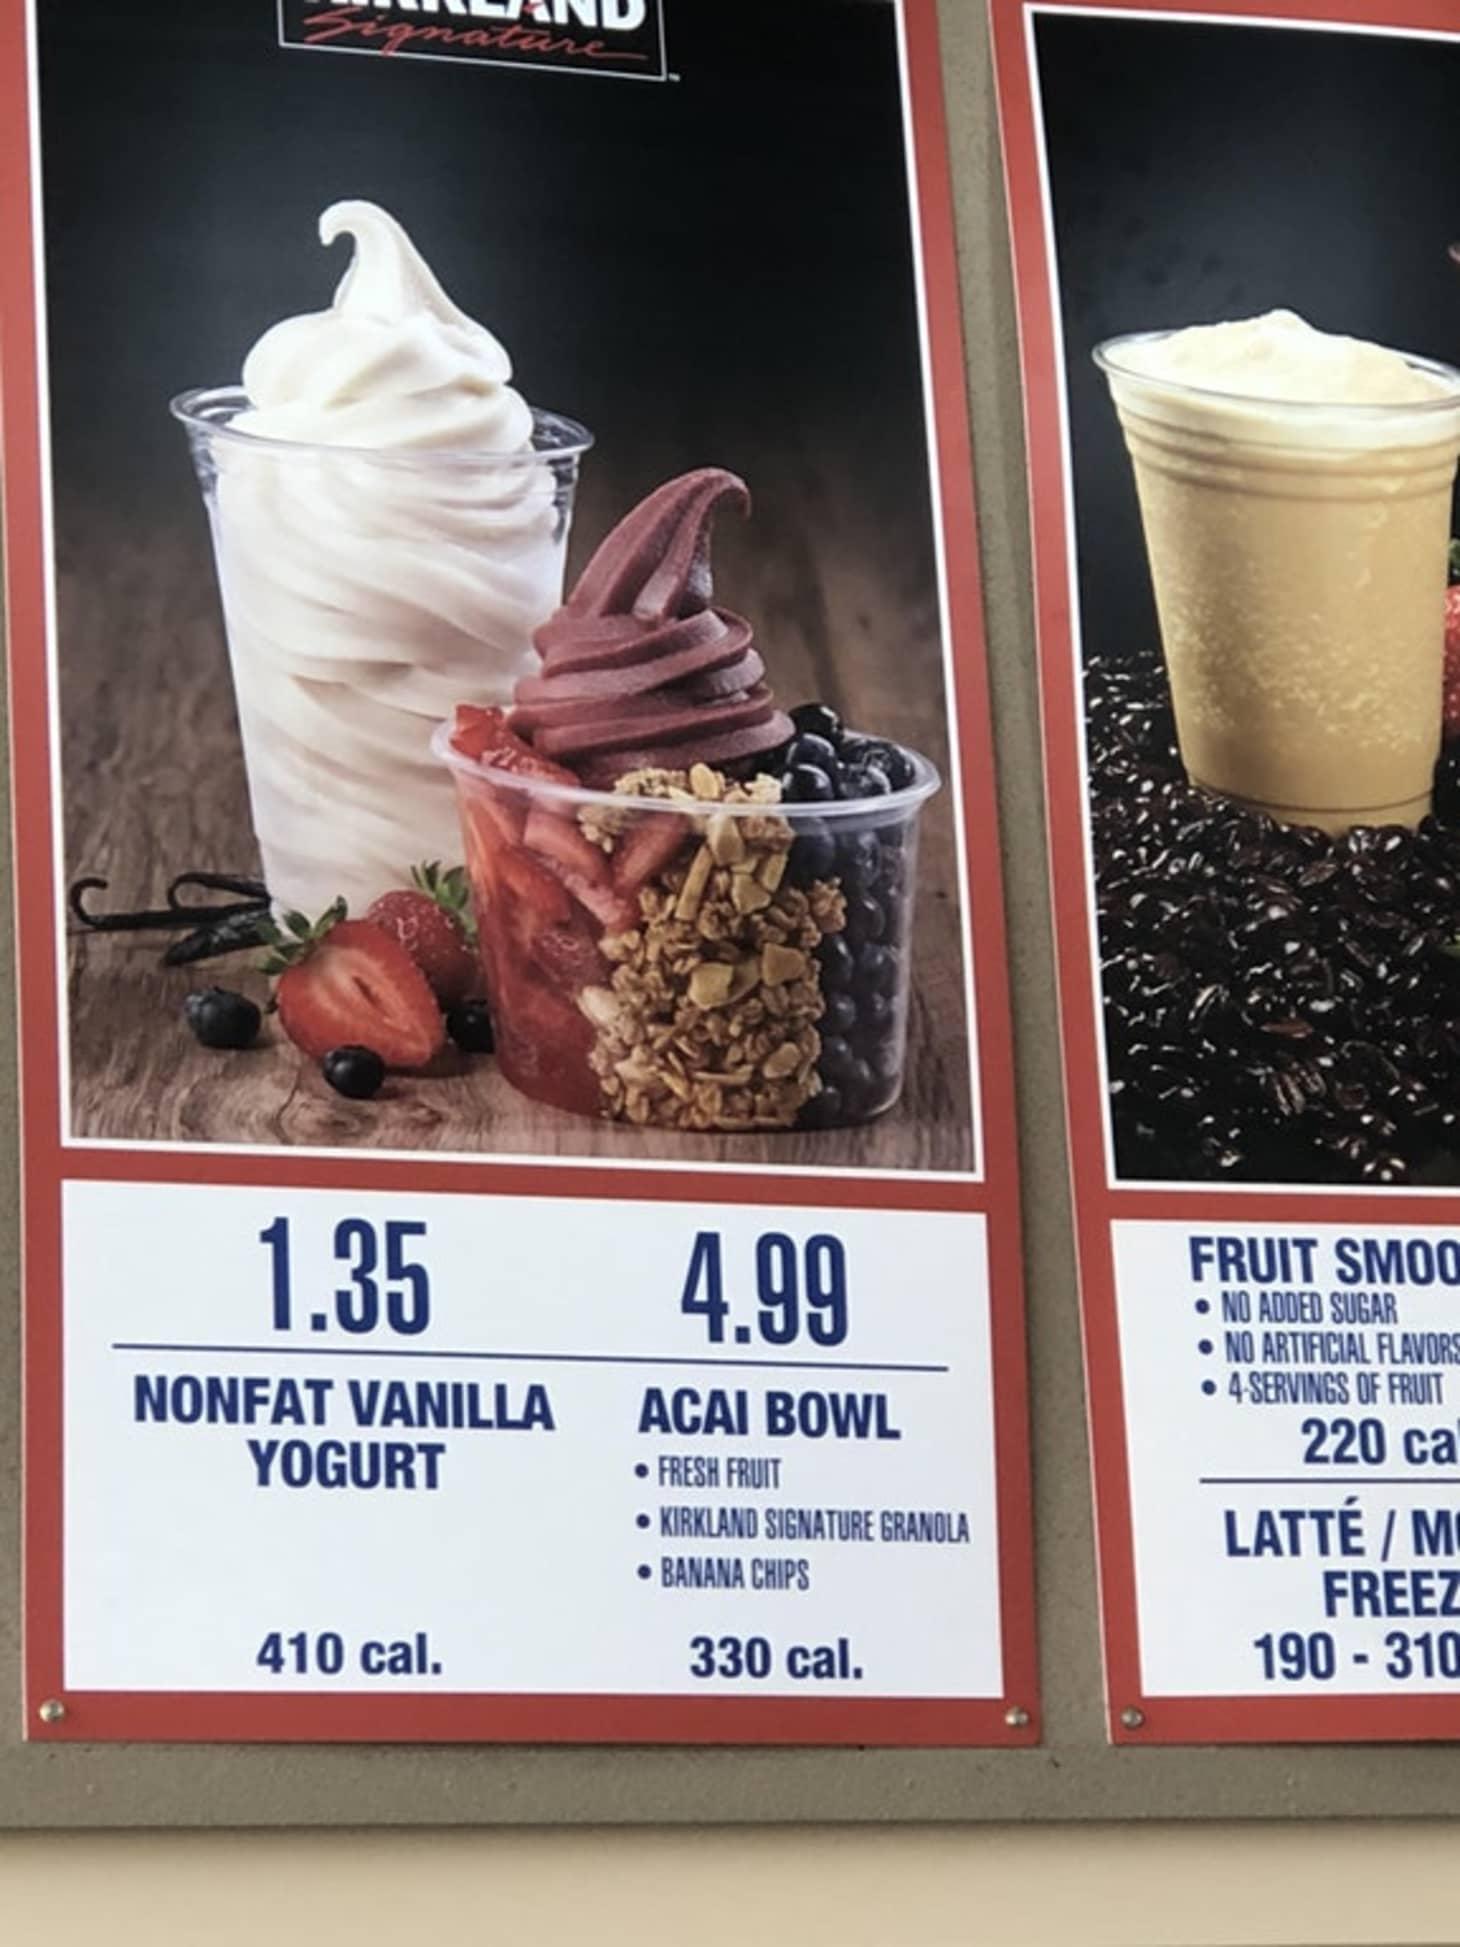 Costco New Acai Bowl - California Food Court Menu | Kitchn